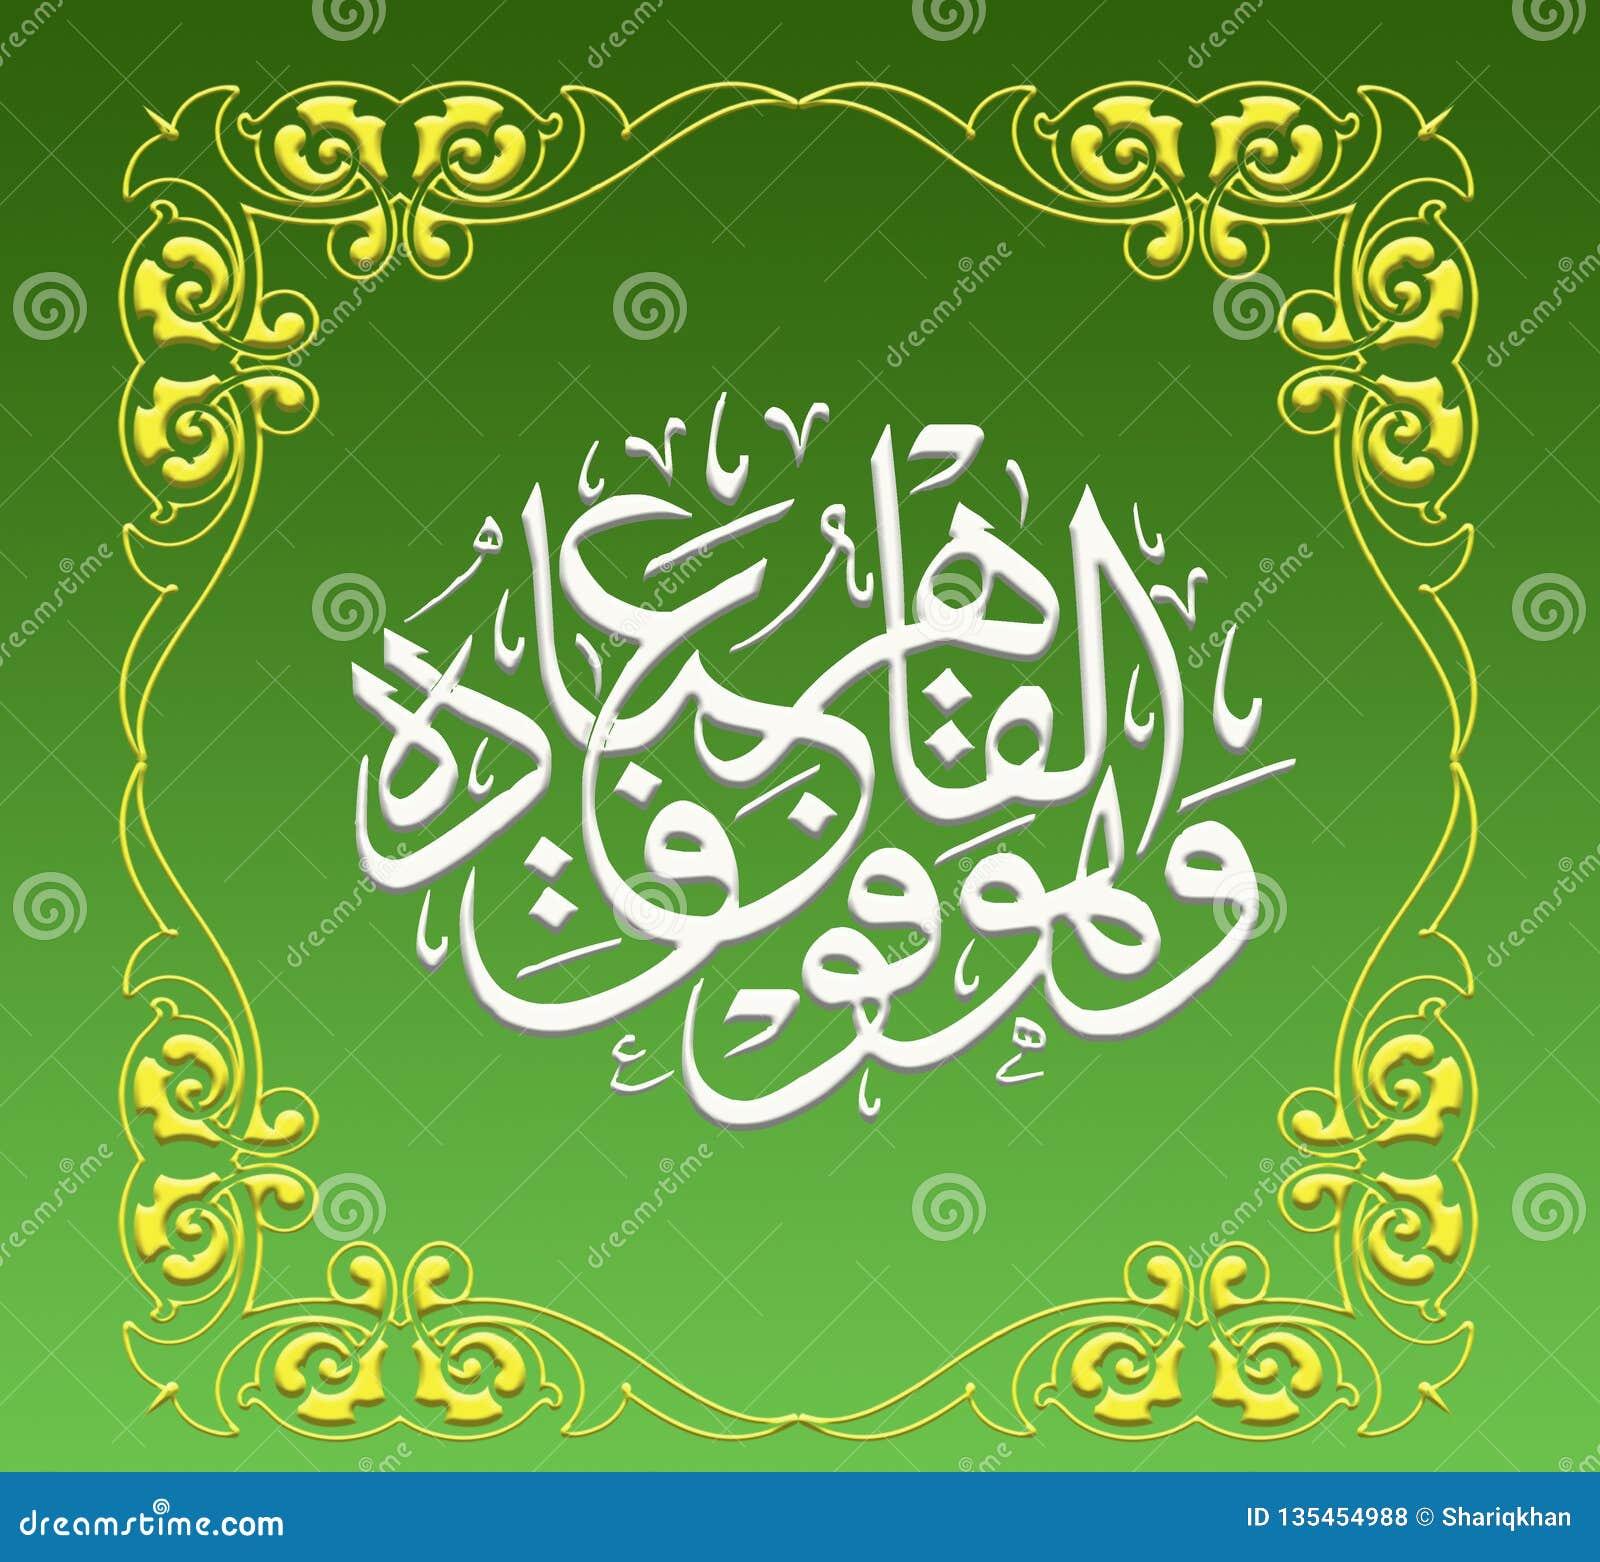 Quran Islamic Arabic Calligraphy Ayat On Green Gradient